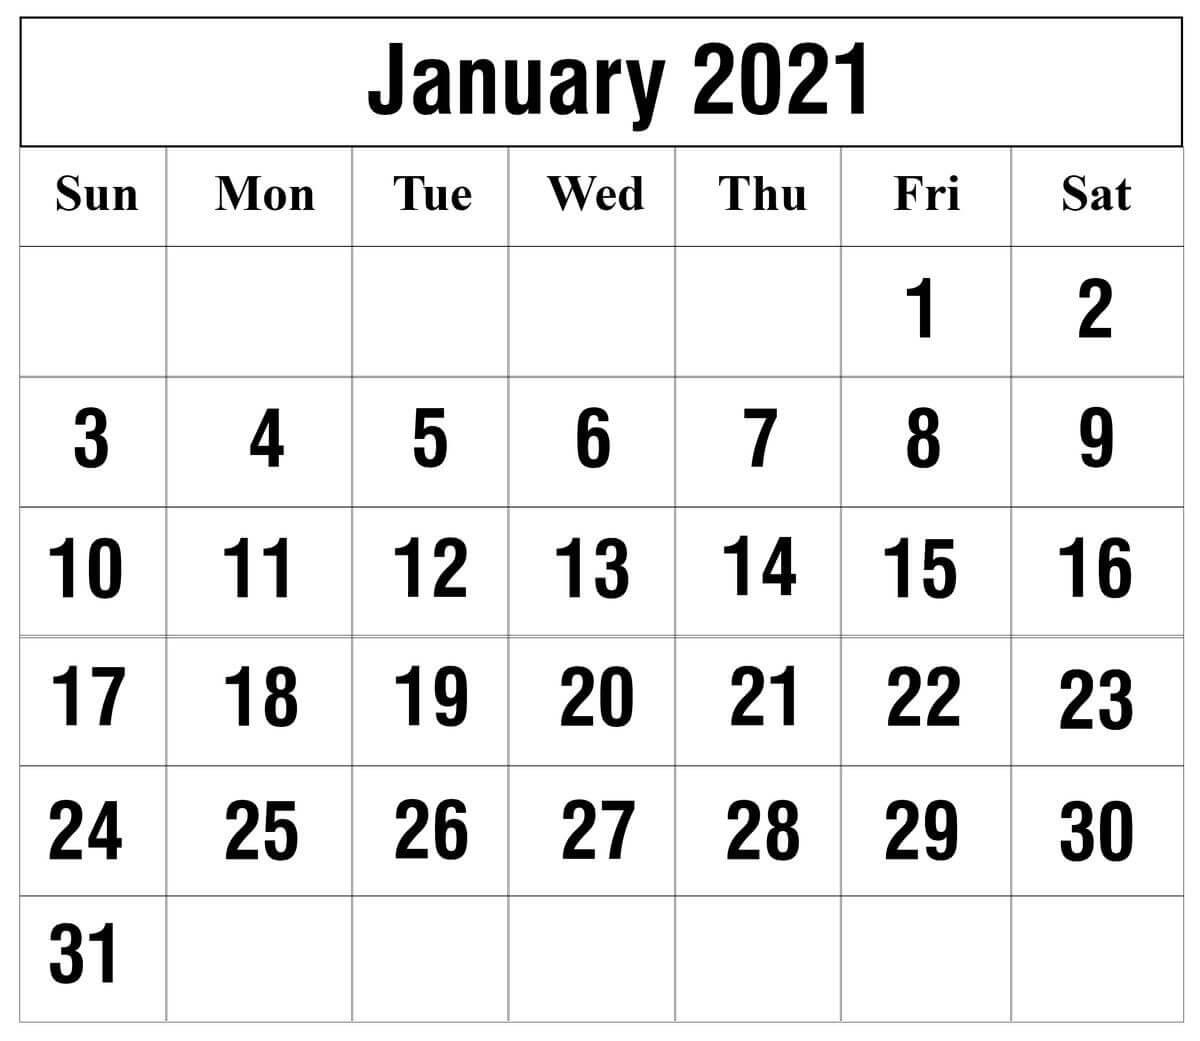 January 2021 Calendar Pdf, Word, Excel Printable Templates